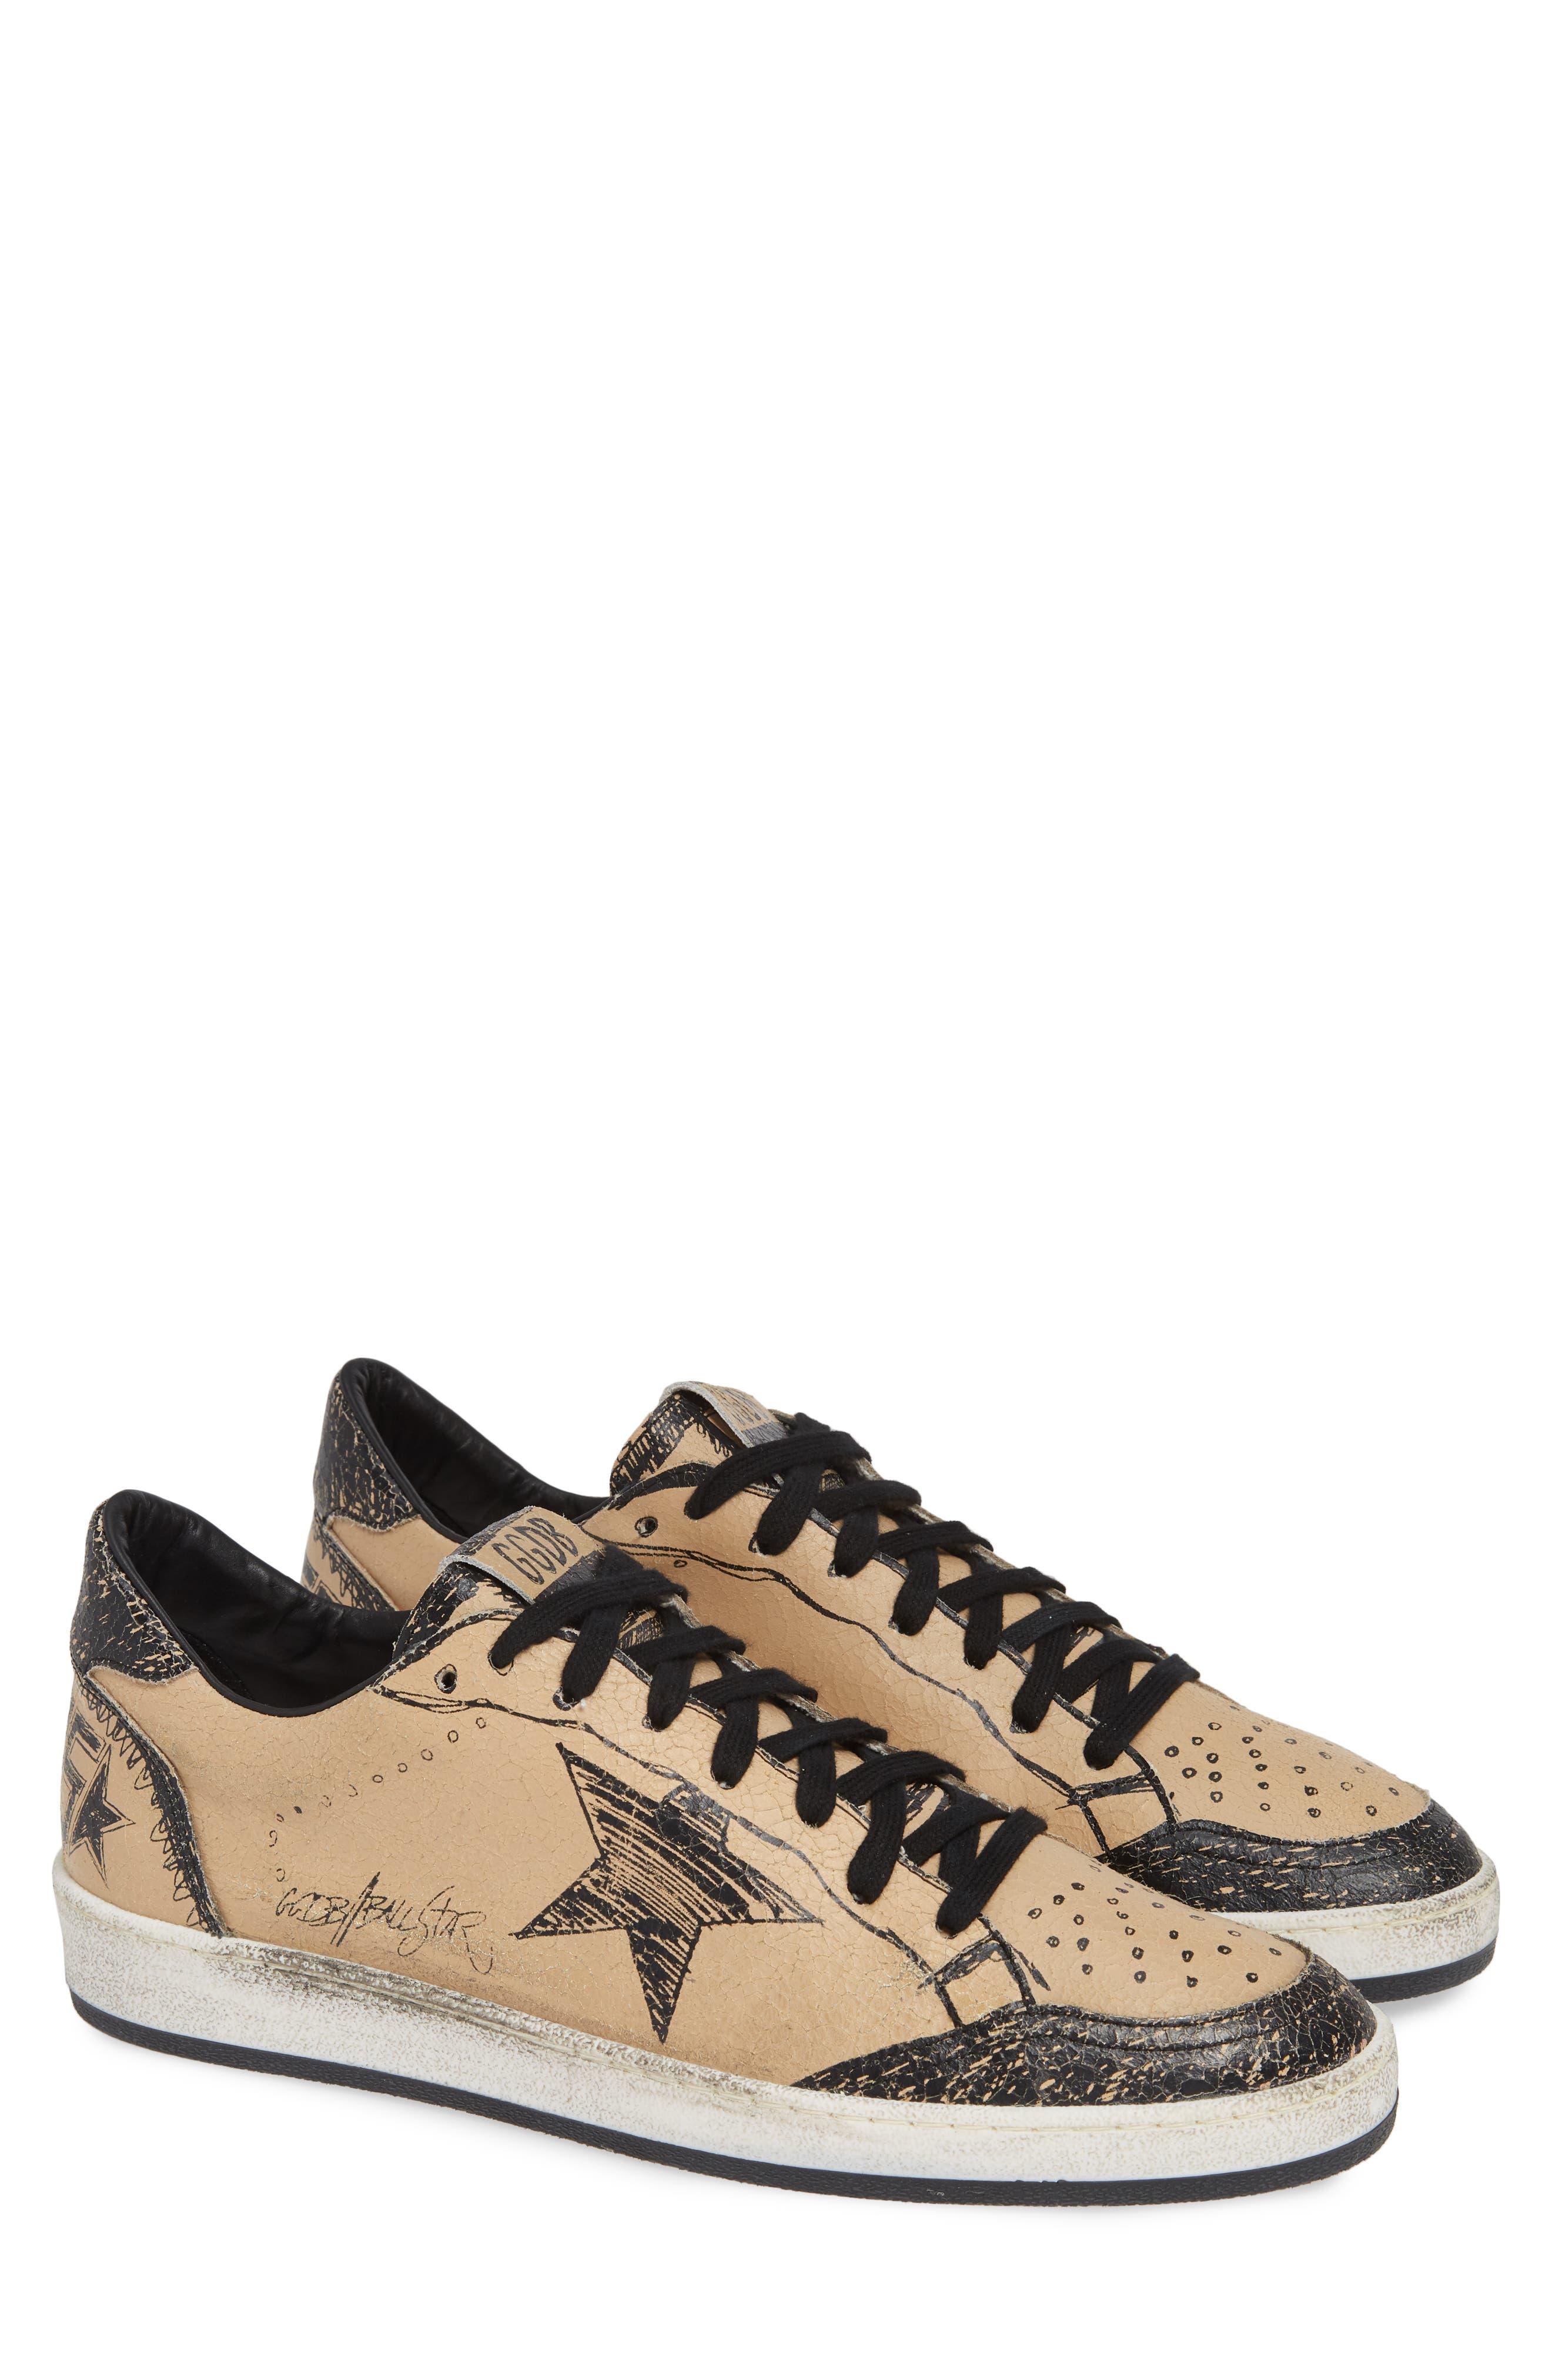 GOLDEN GOOSE B-Ball Star Sneaker, Main, color, BLACK DRAWING